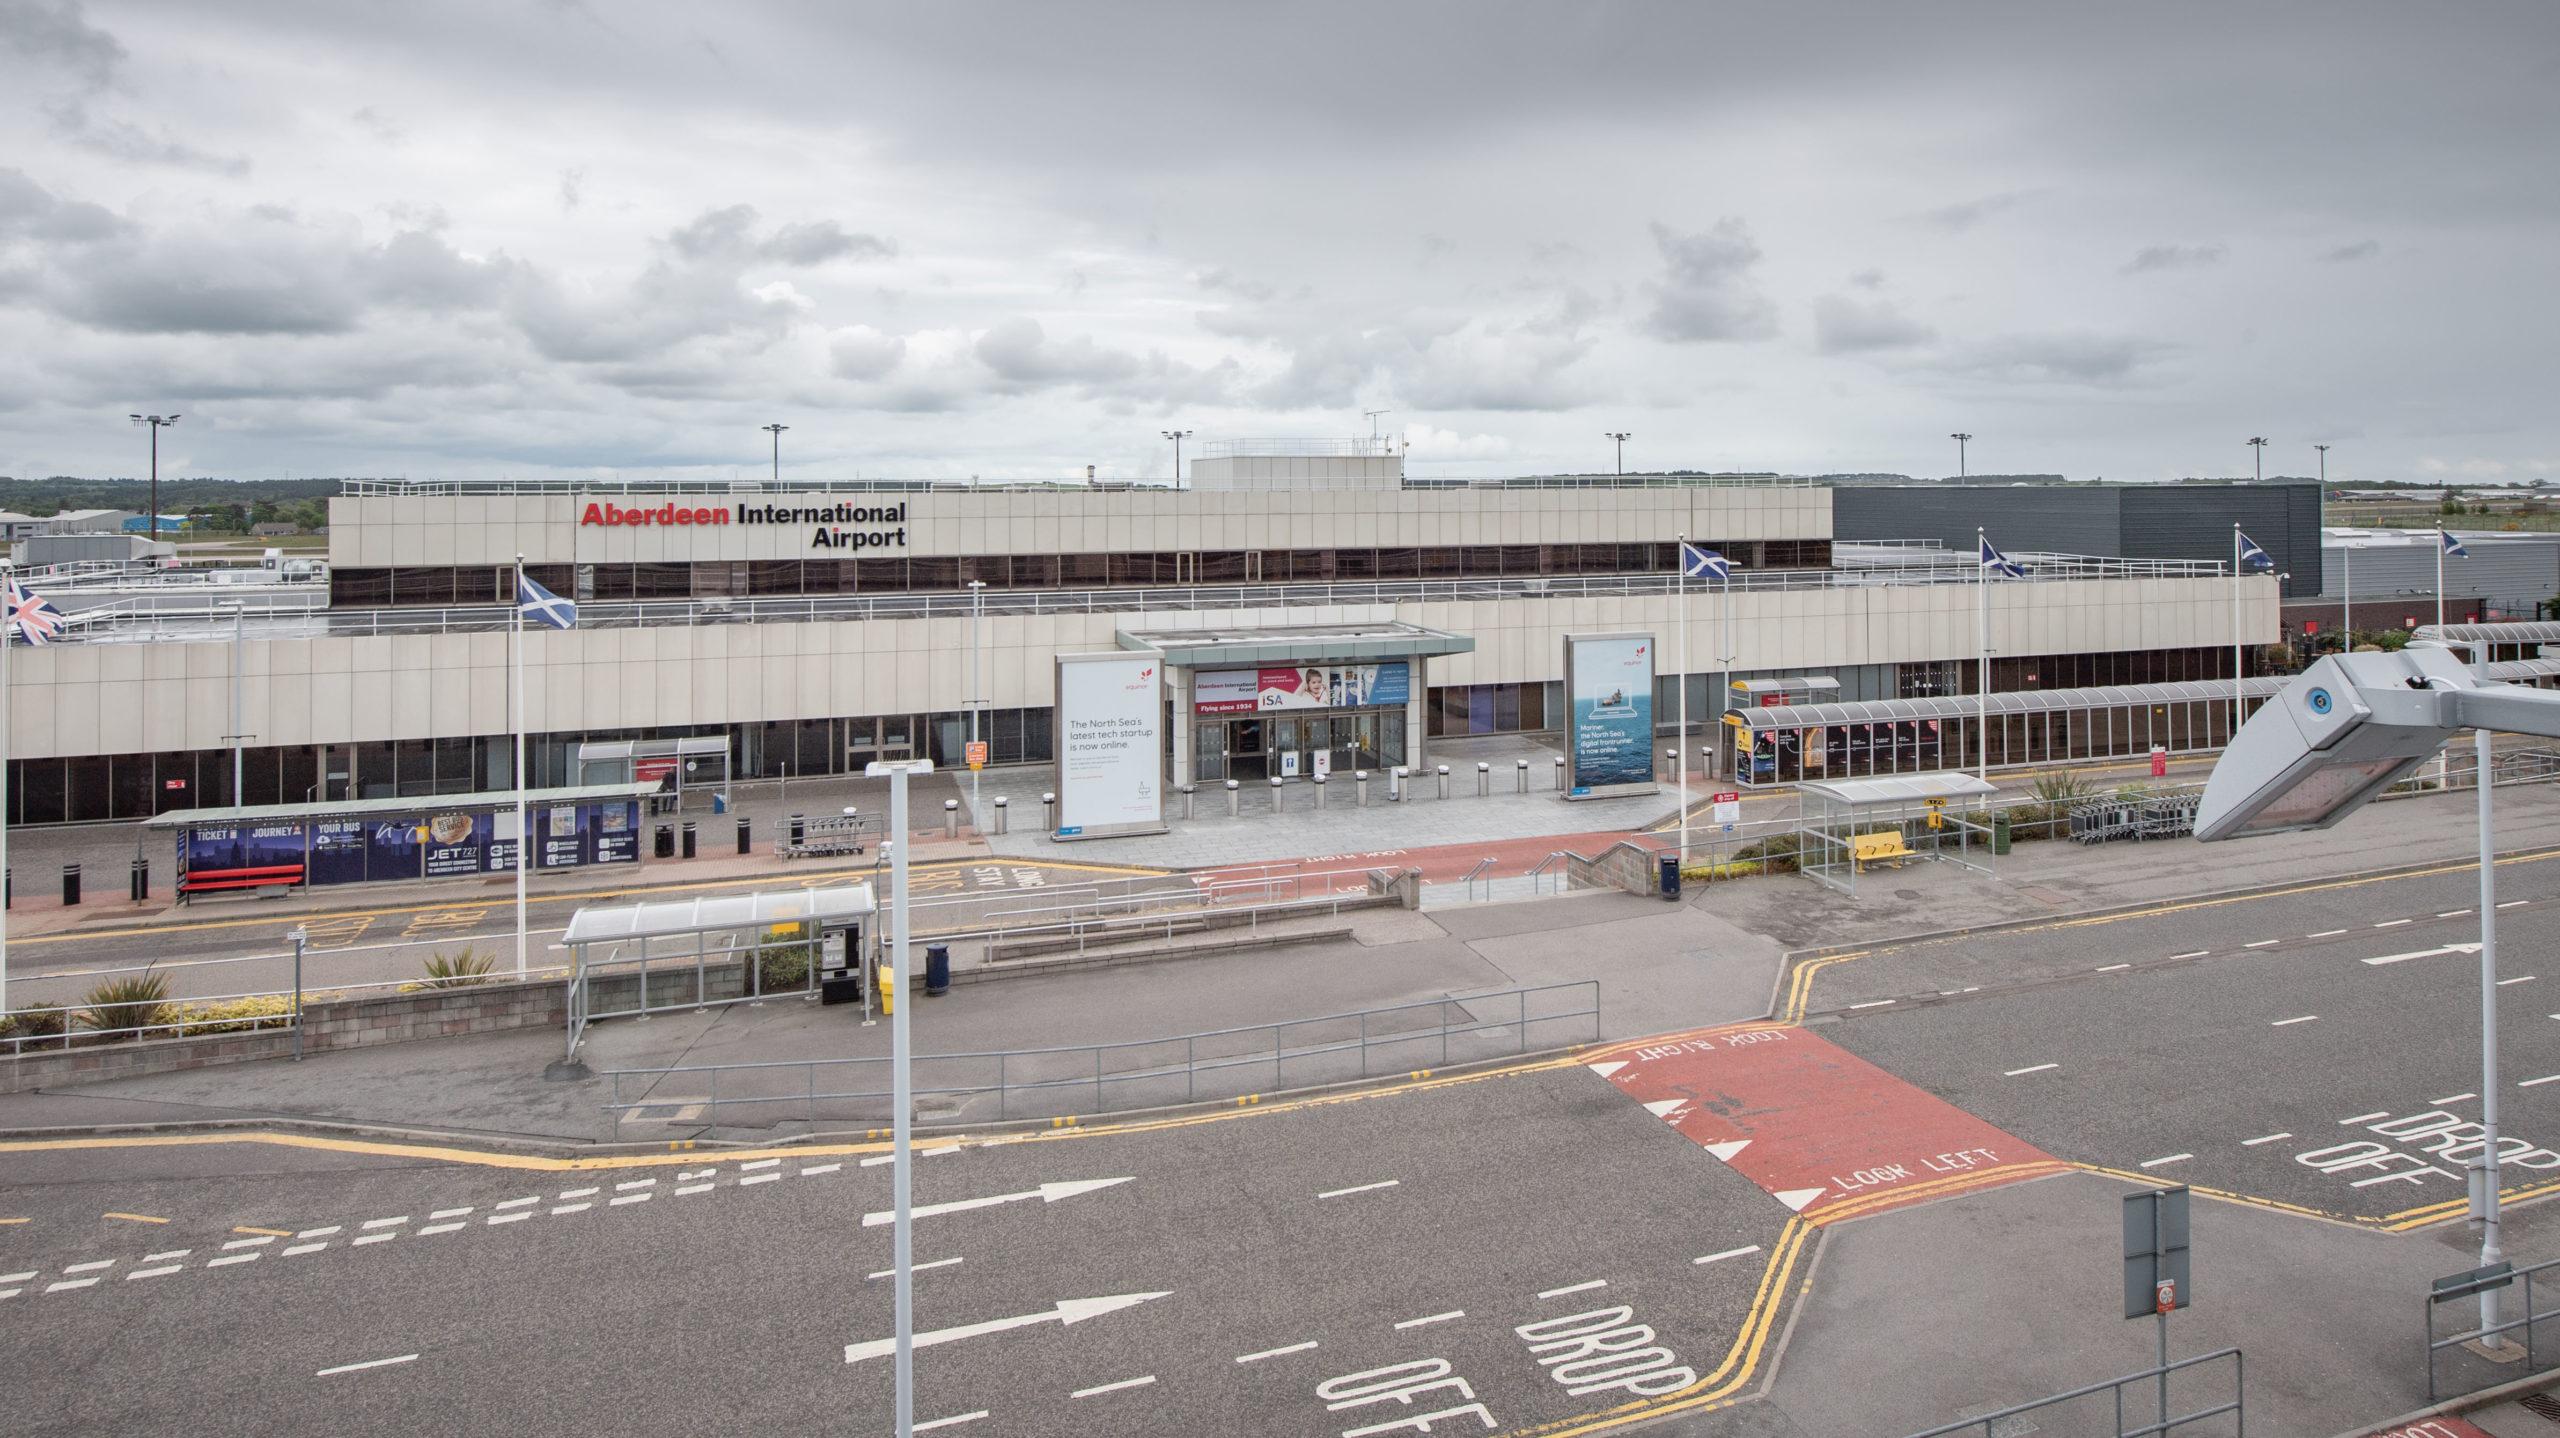 Aberdeen airport Picture by Abermedia / Michal Wachucik